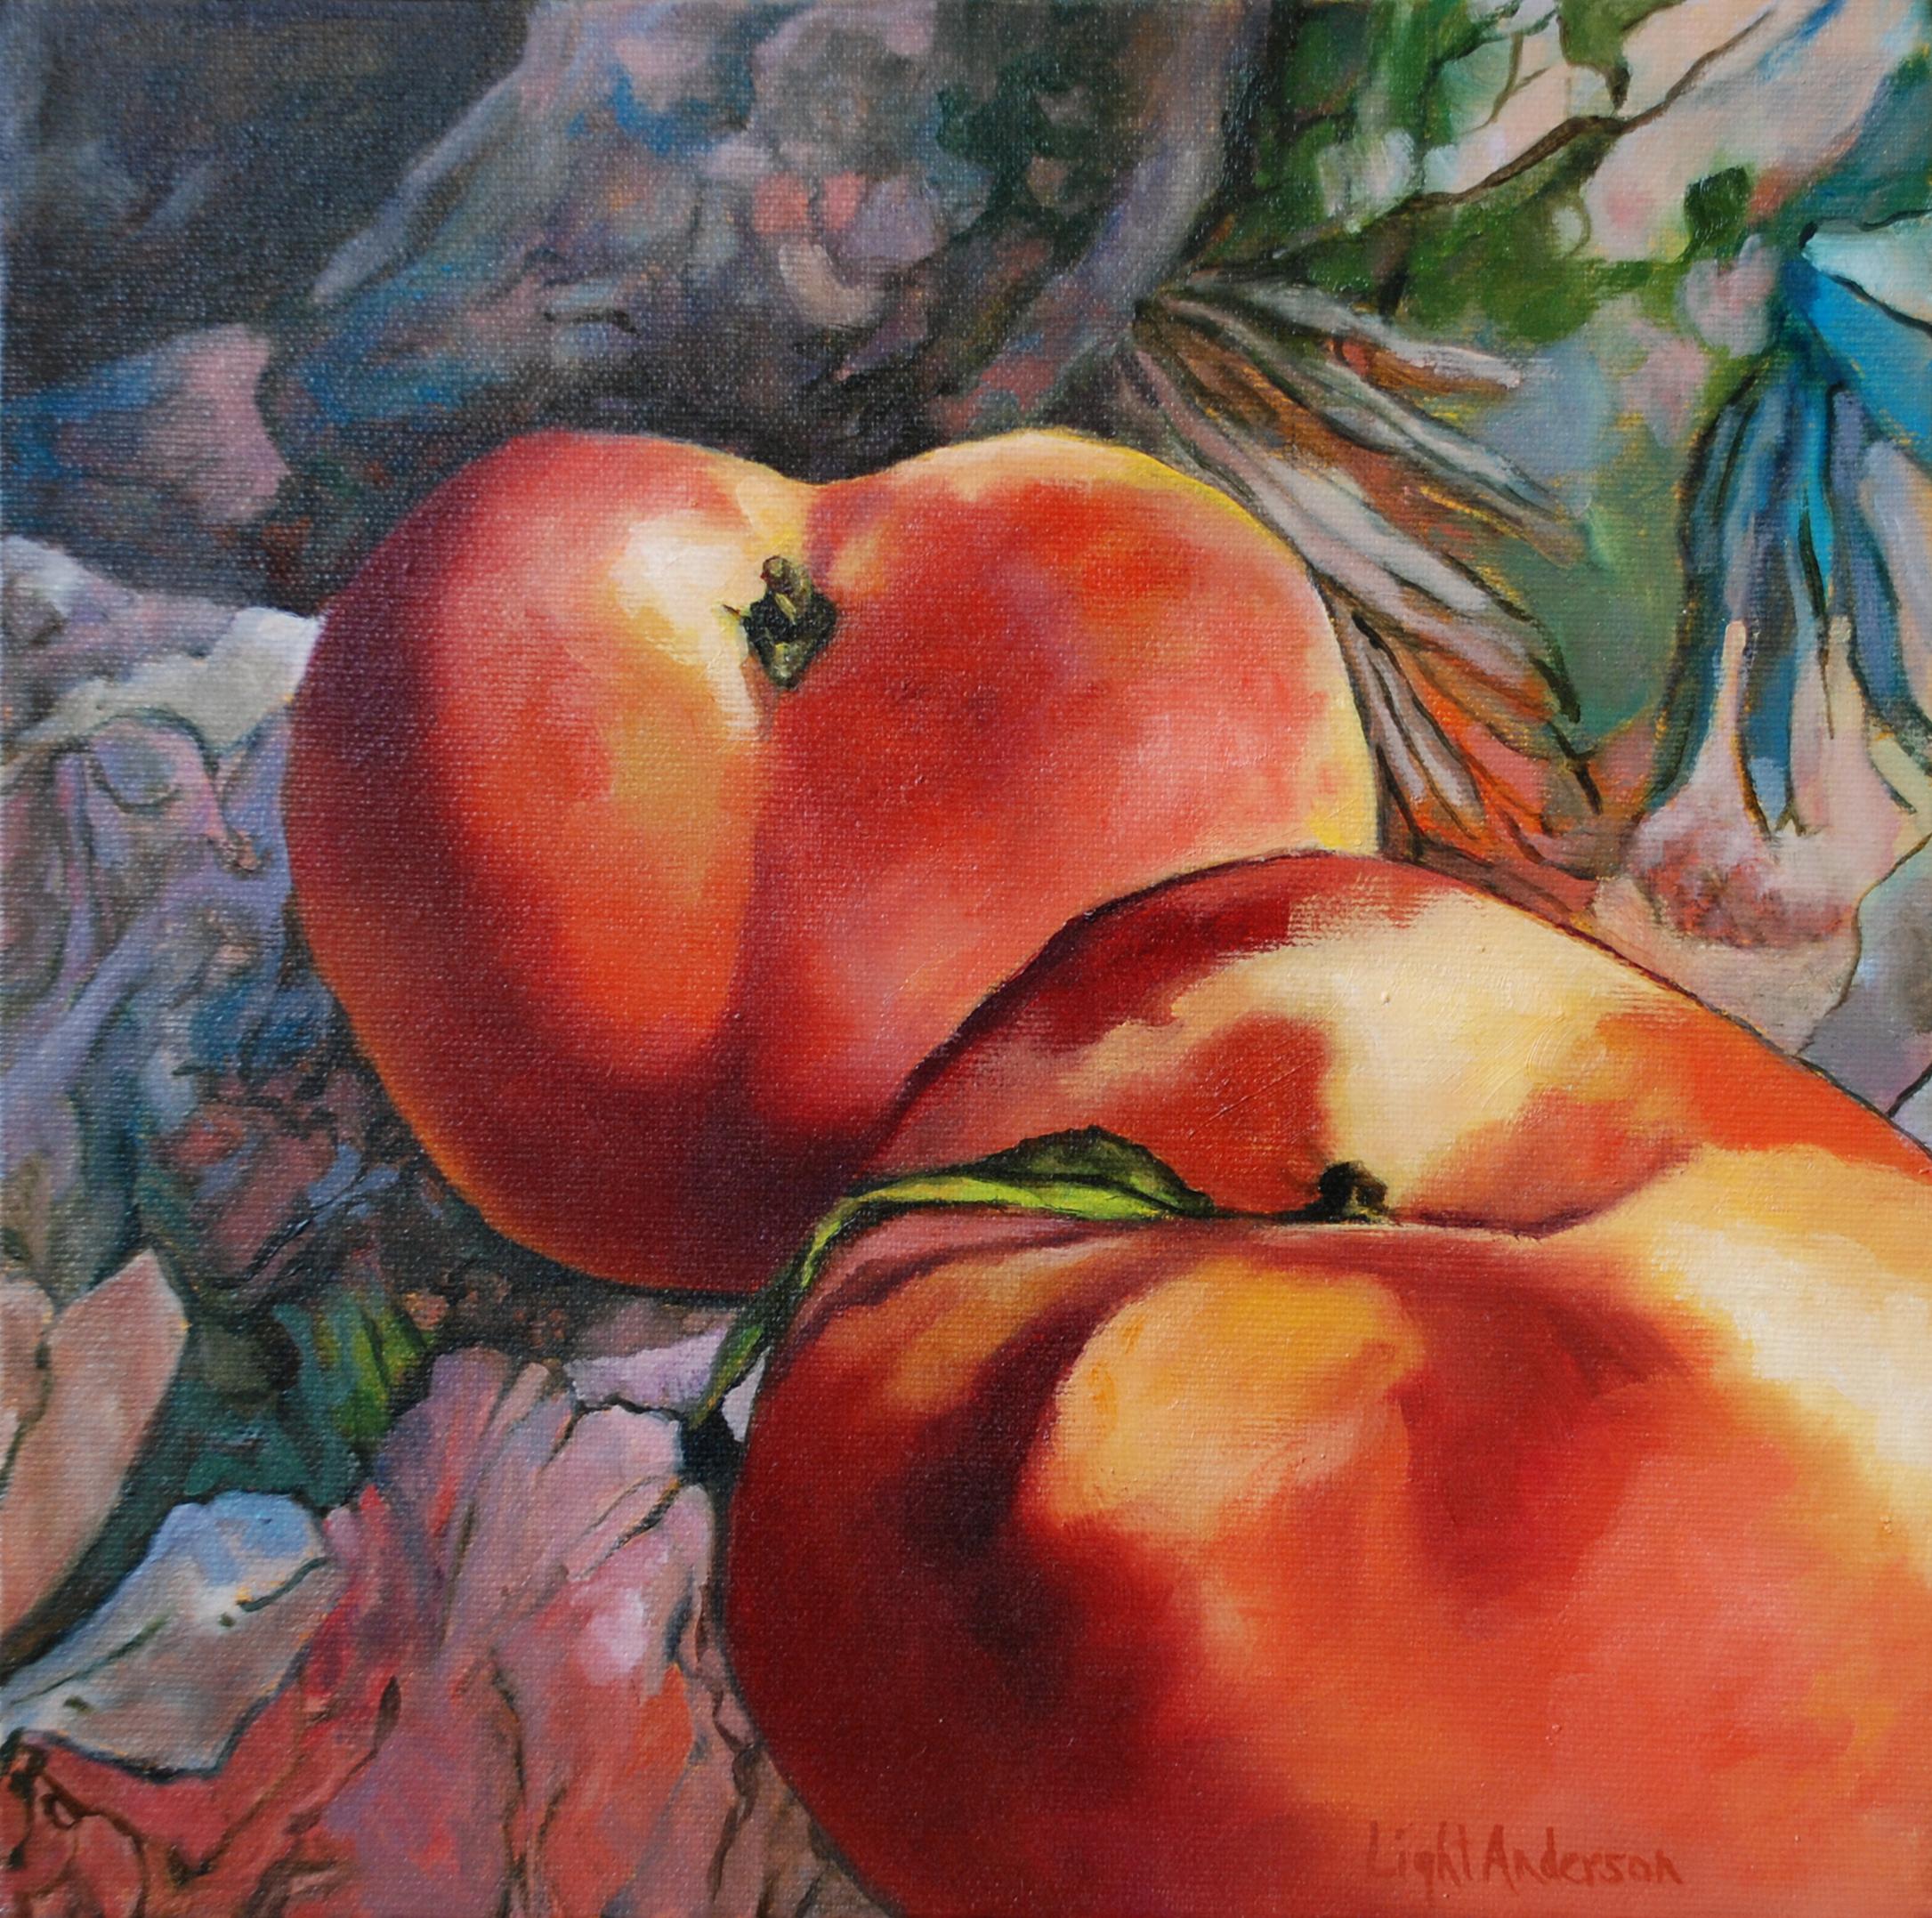 Saturn Peaches on Fabric